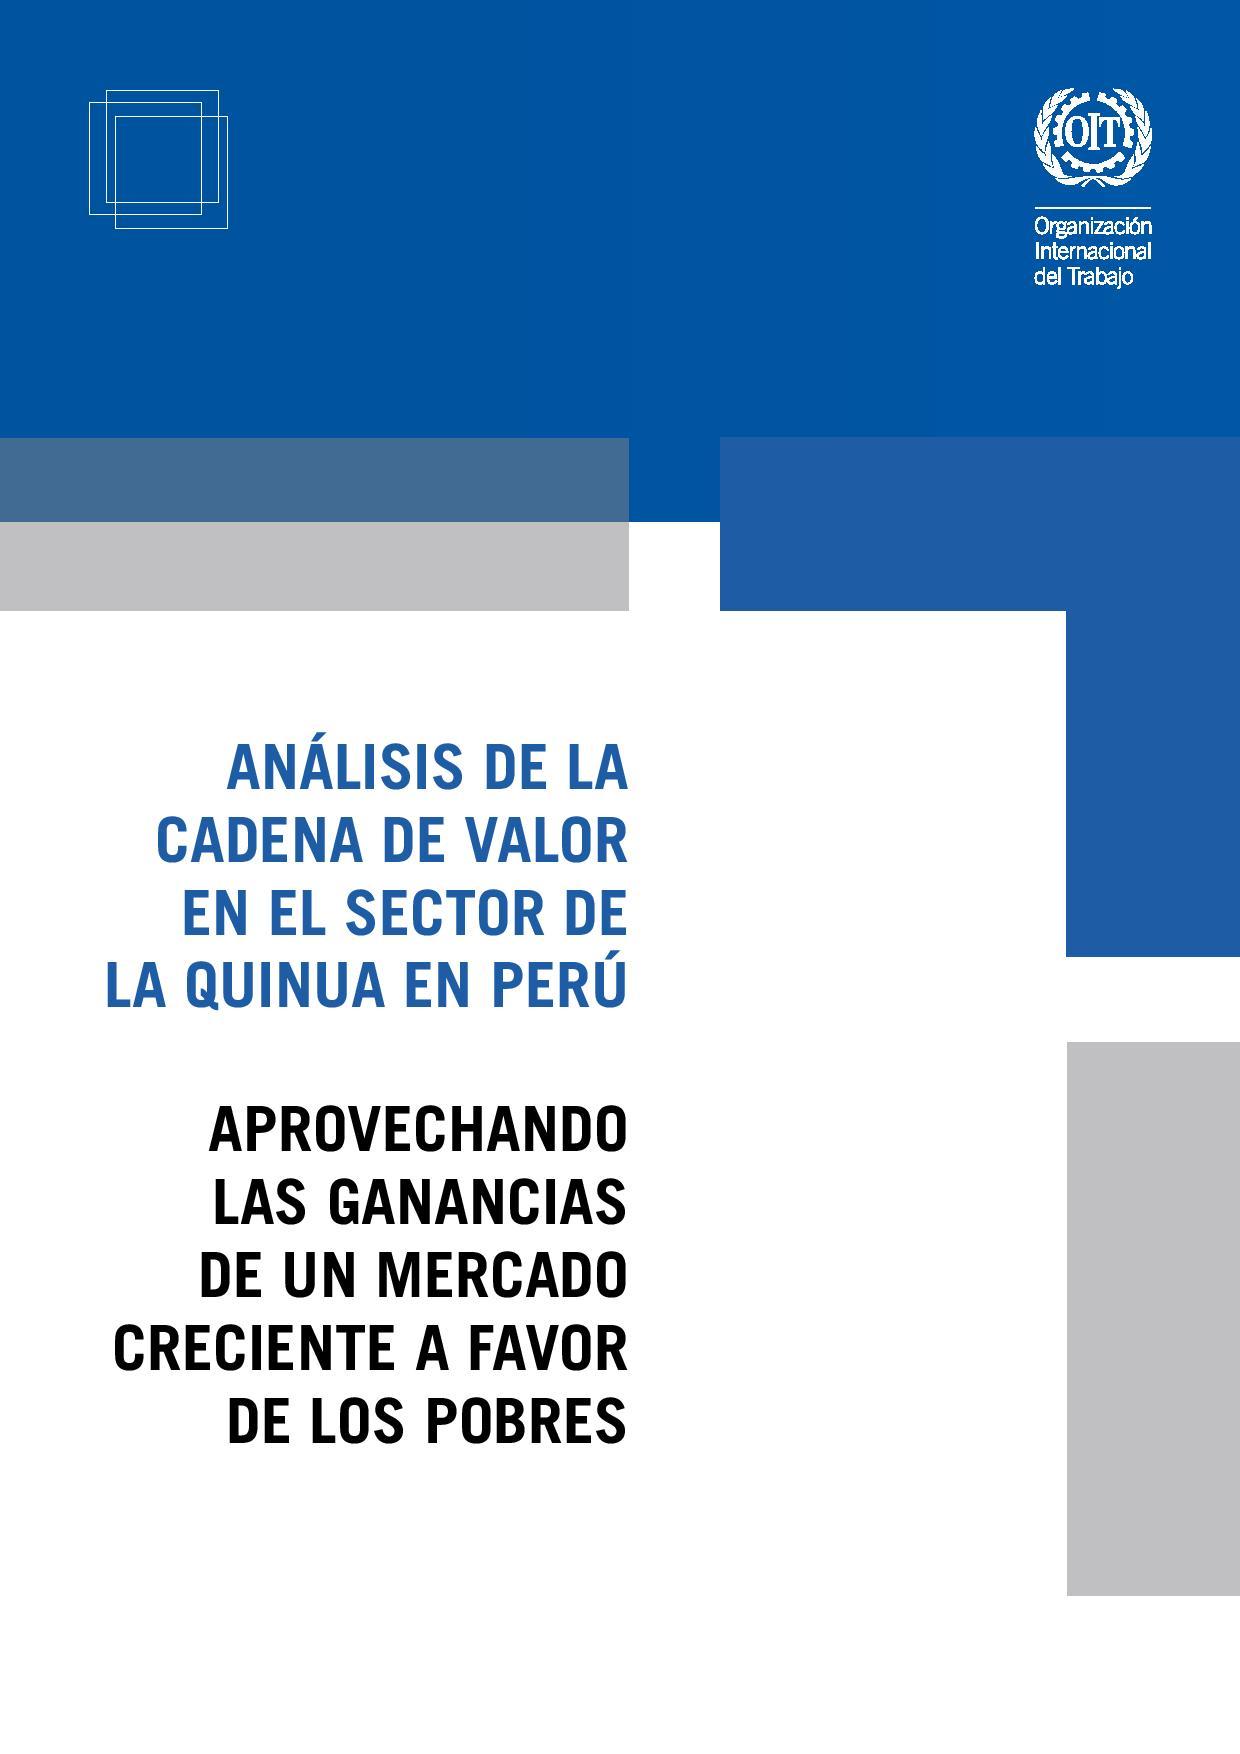 Document in spanish: Value chain analysis in Peru's quinoa sector